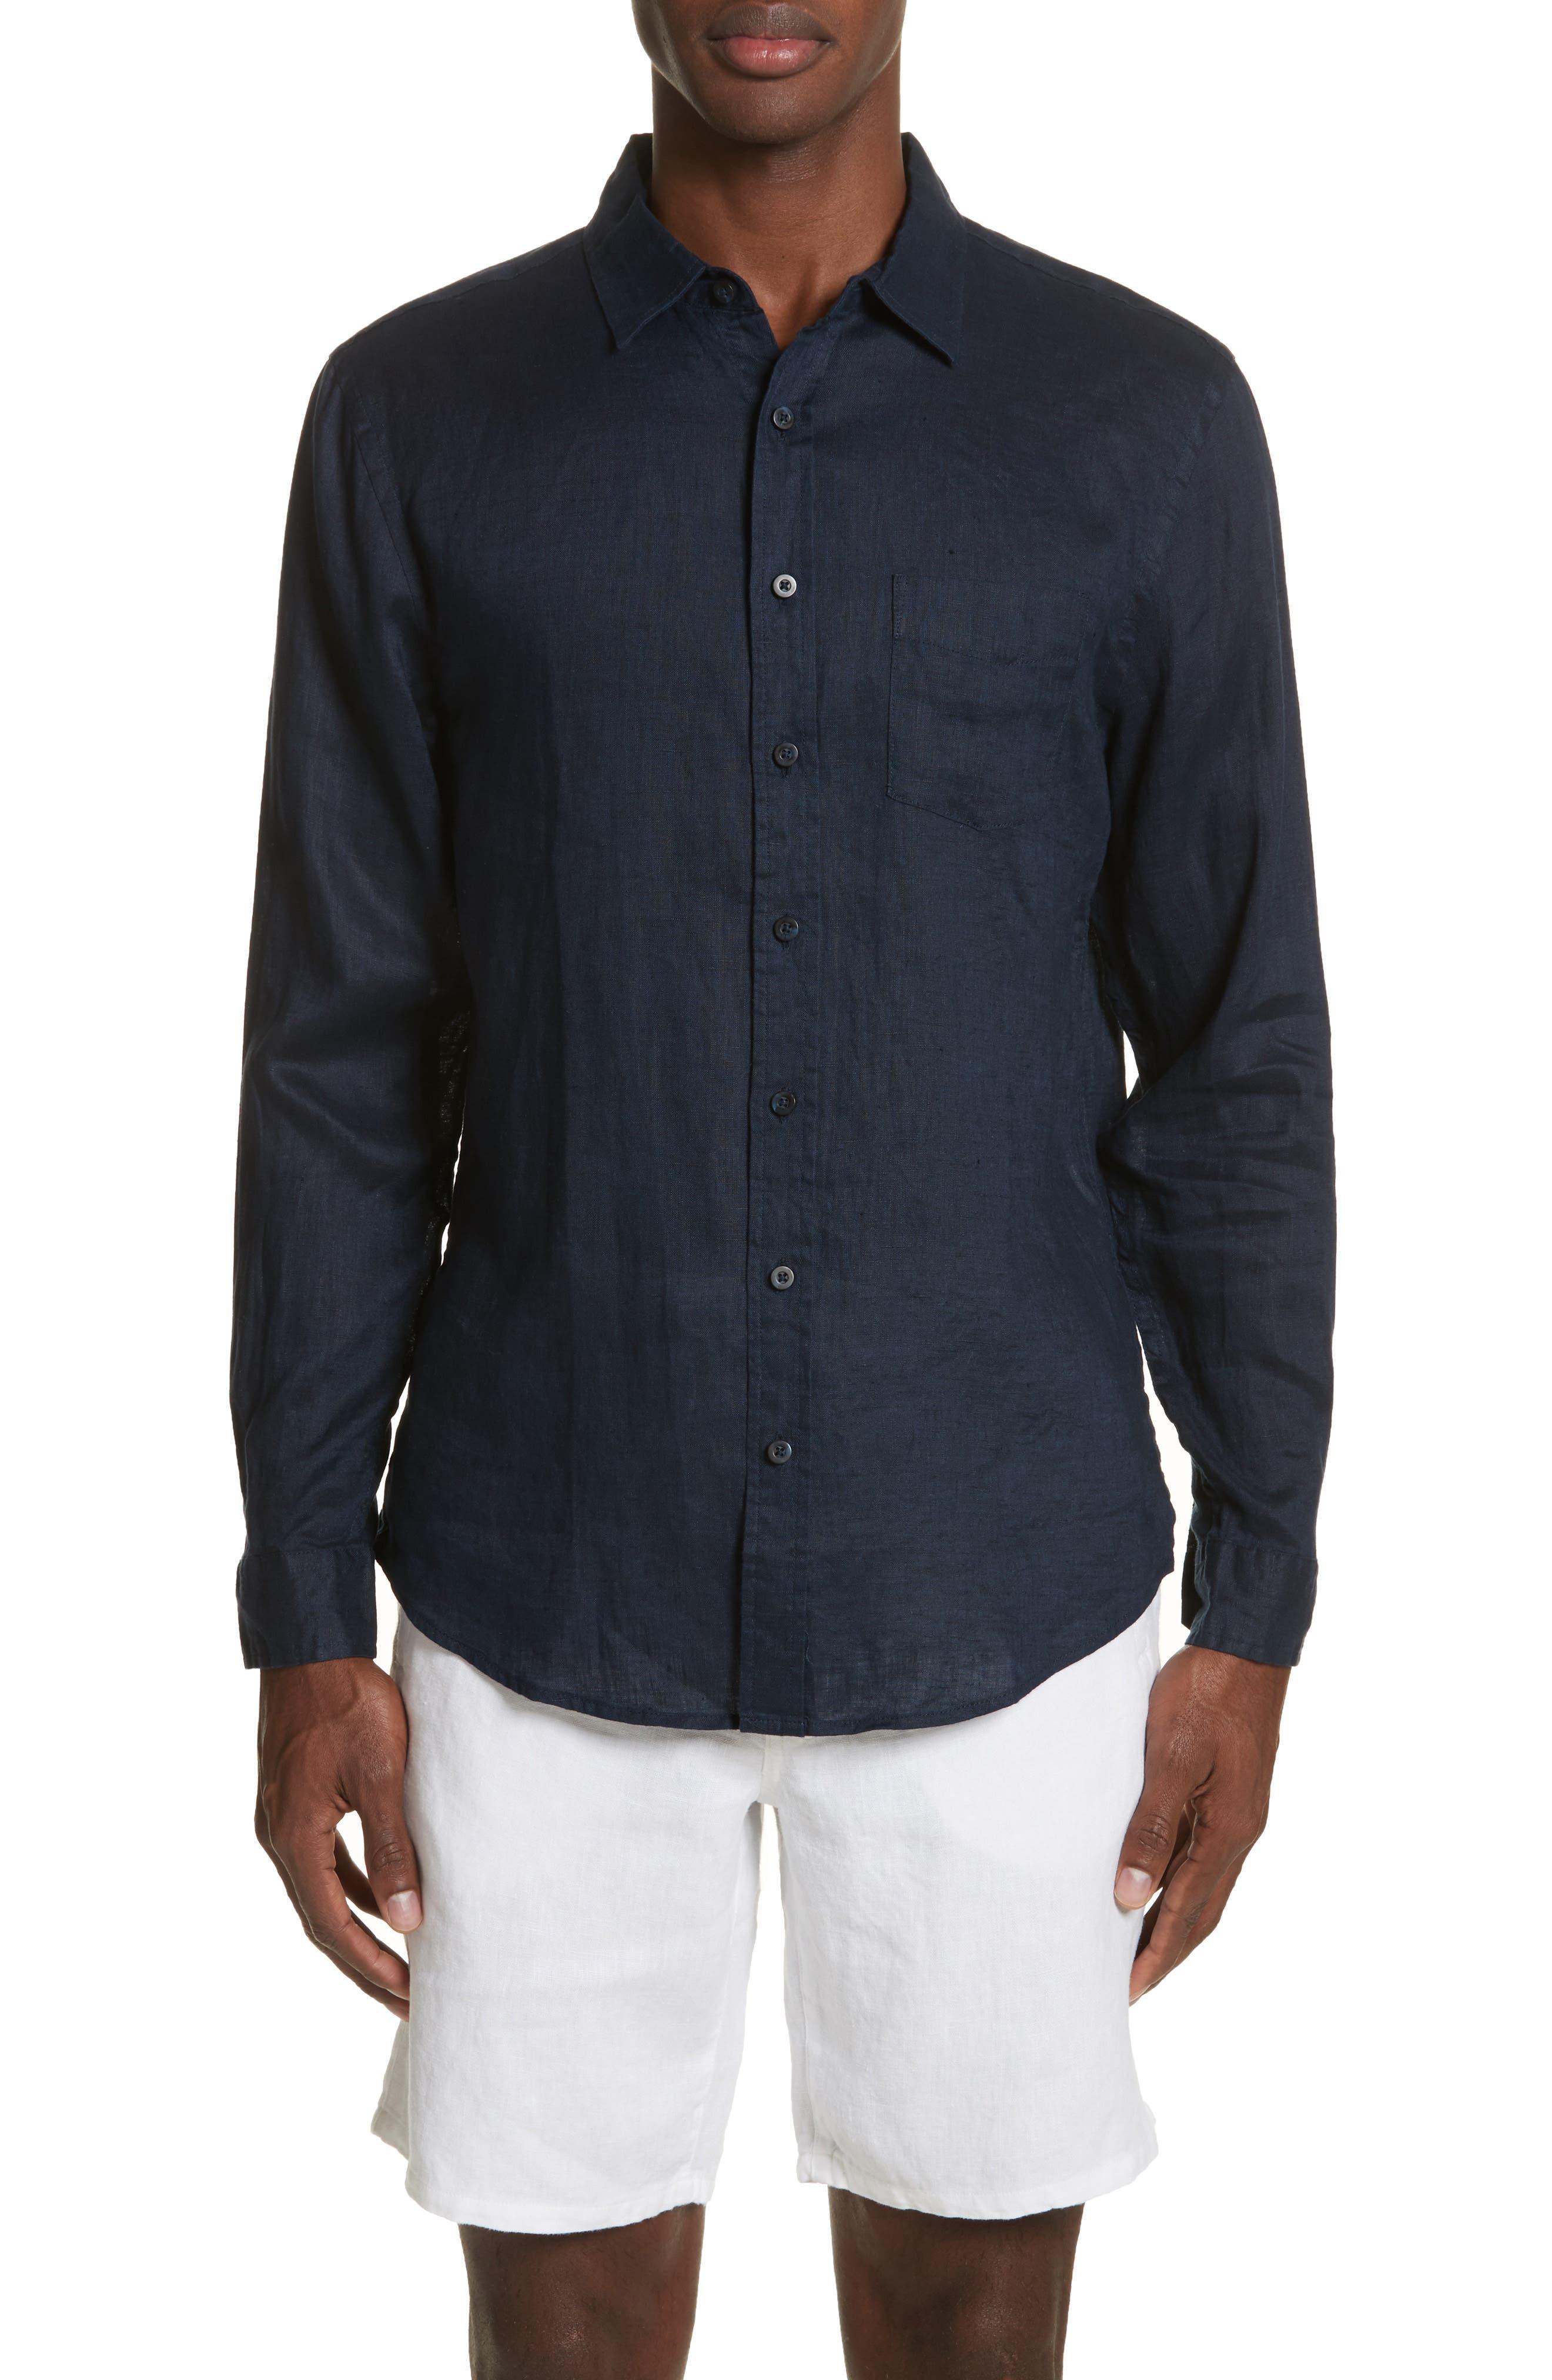 Alternate Image 1 Selected - ONIA Abe Linen Shirt